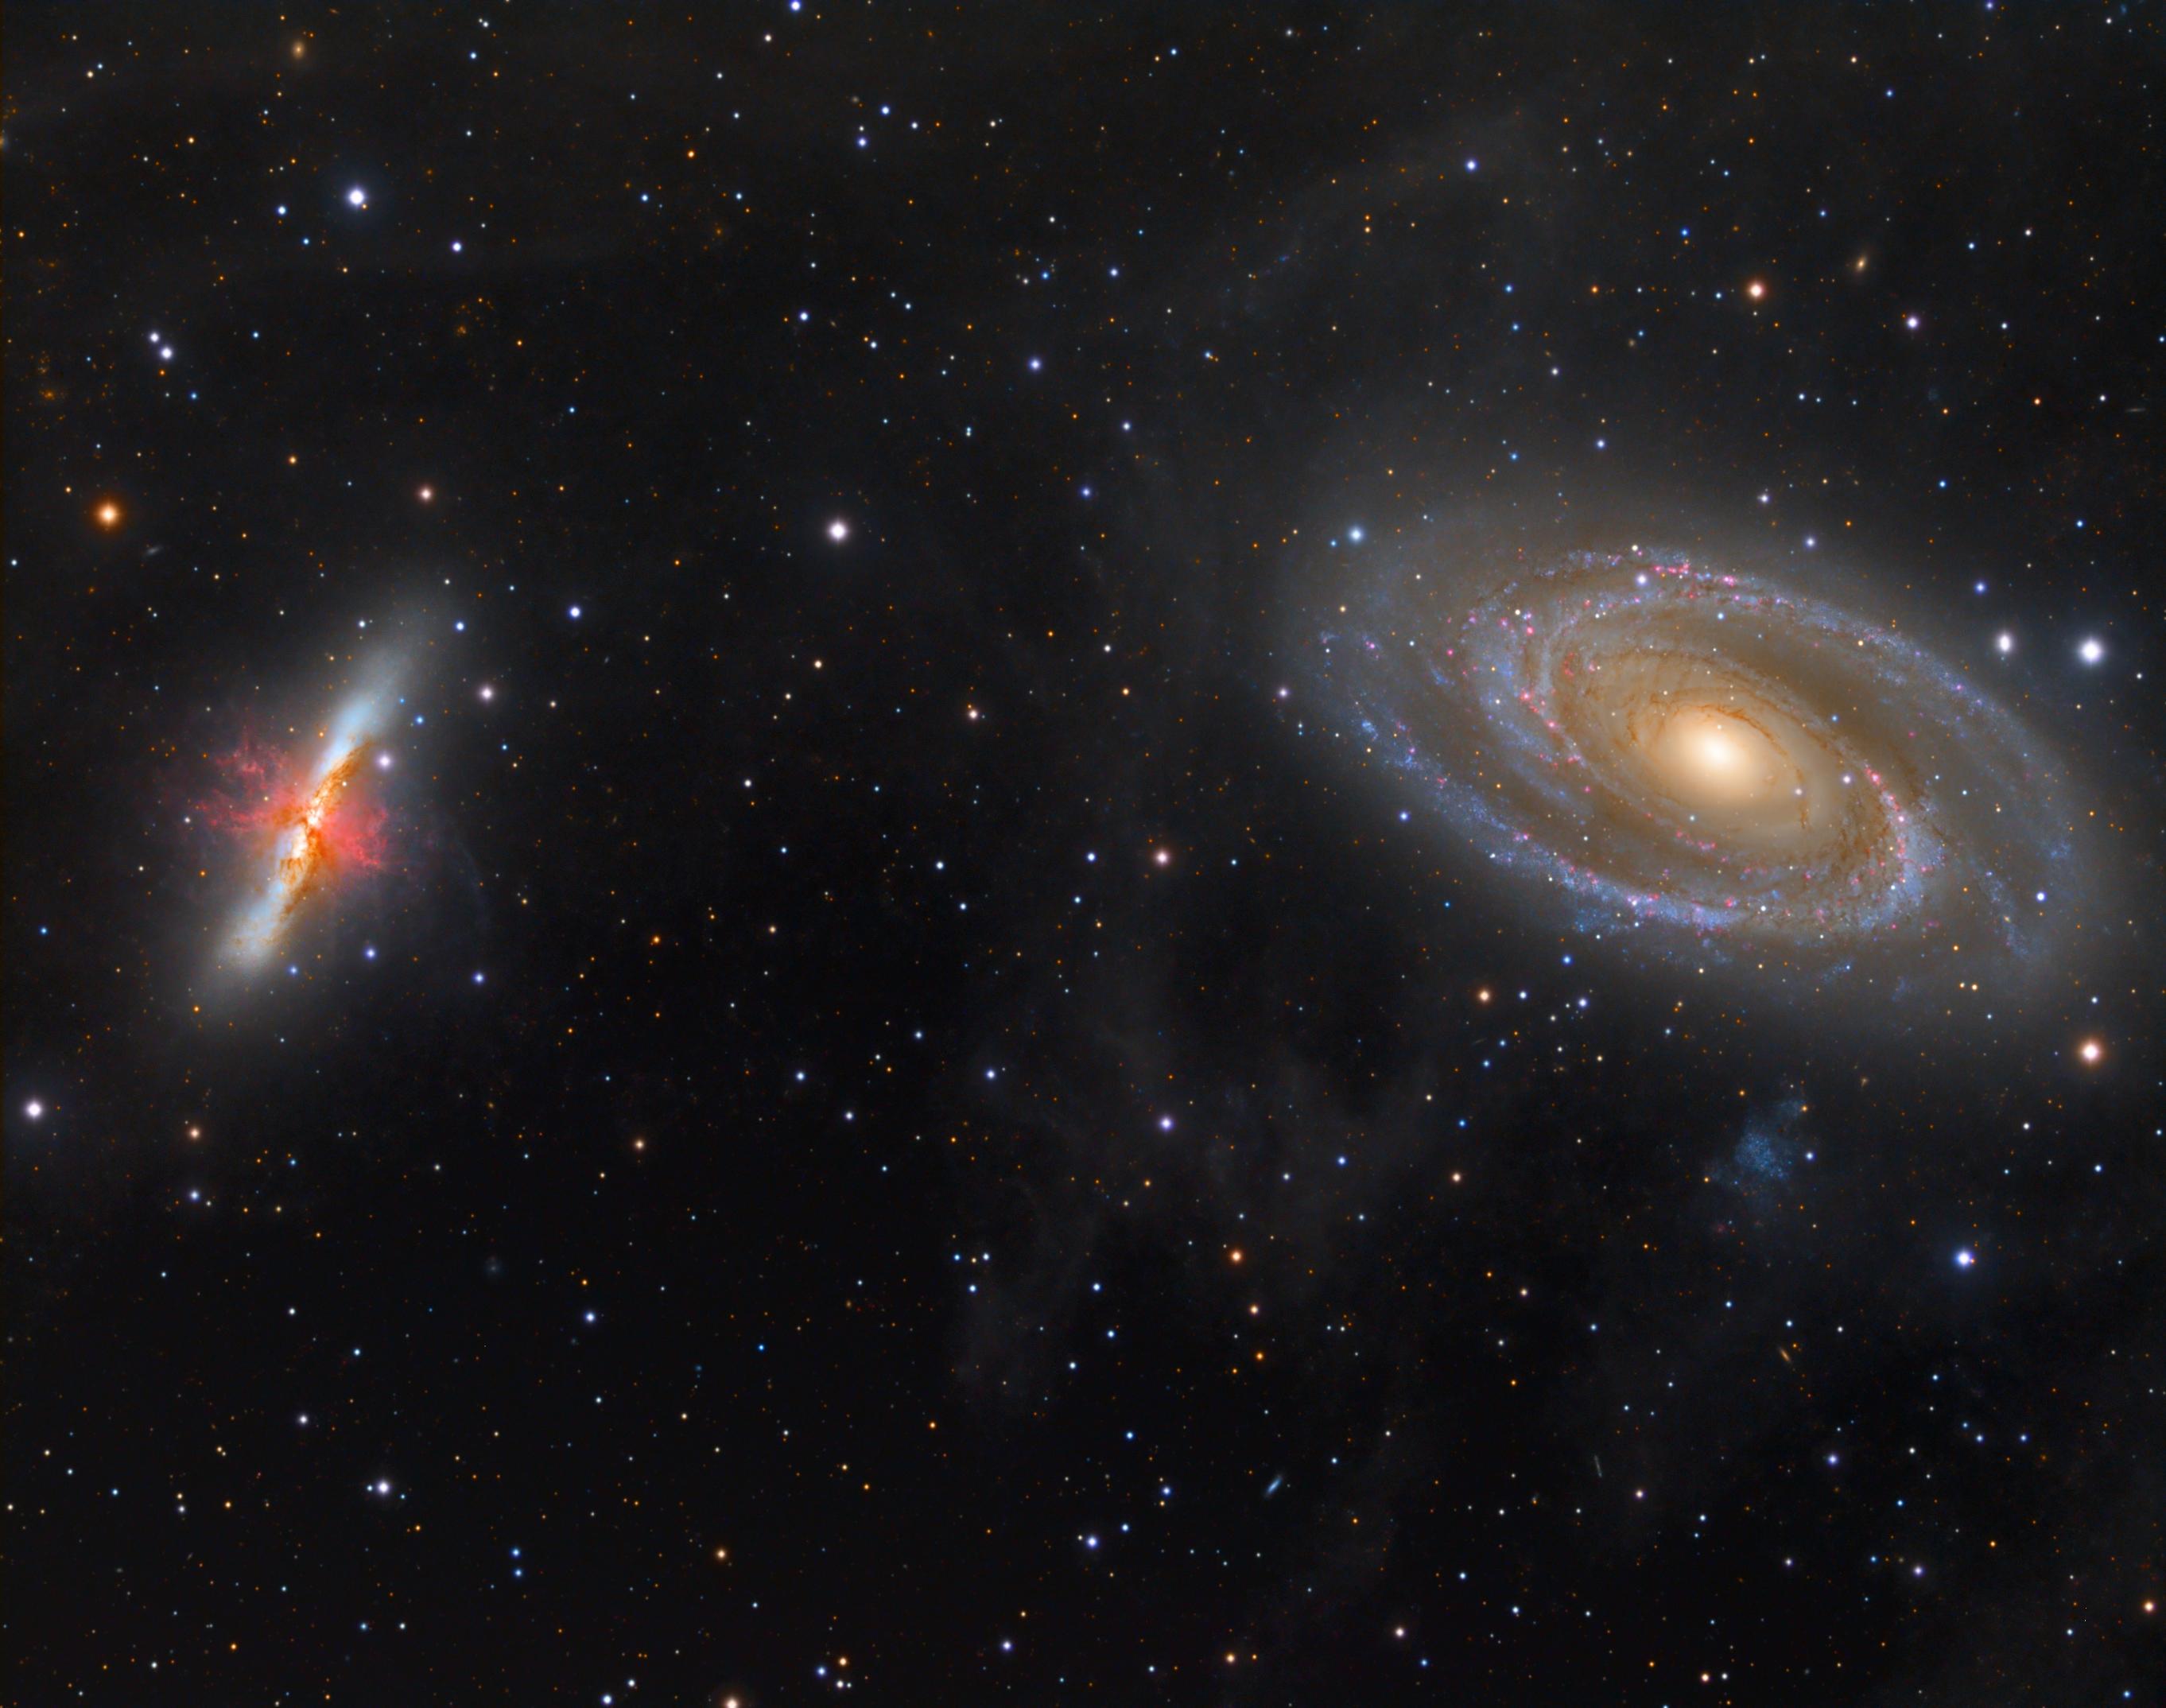 M81-82_koniec   Telescope: TEC140 f/5.2 Camera: QHY695A Mount: Paramount MyT Exposure: Exposure: (Ha,L,R,G,B) 24,5h Ha 25x900s, L 26x60s, L 59x600s, R 25x300s , G 25x300s, B 44x300s, (binx1) Date and place: 03.2019, Observatory E-EyE, Fregenal de la Sierra, Spain